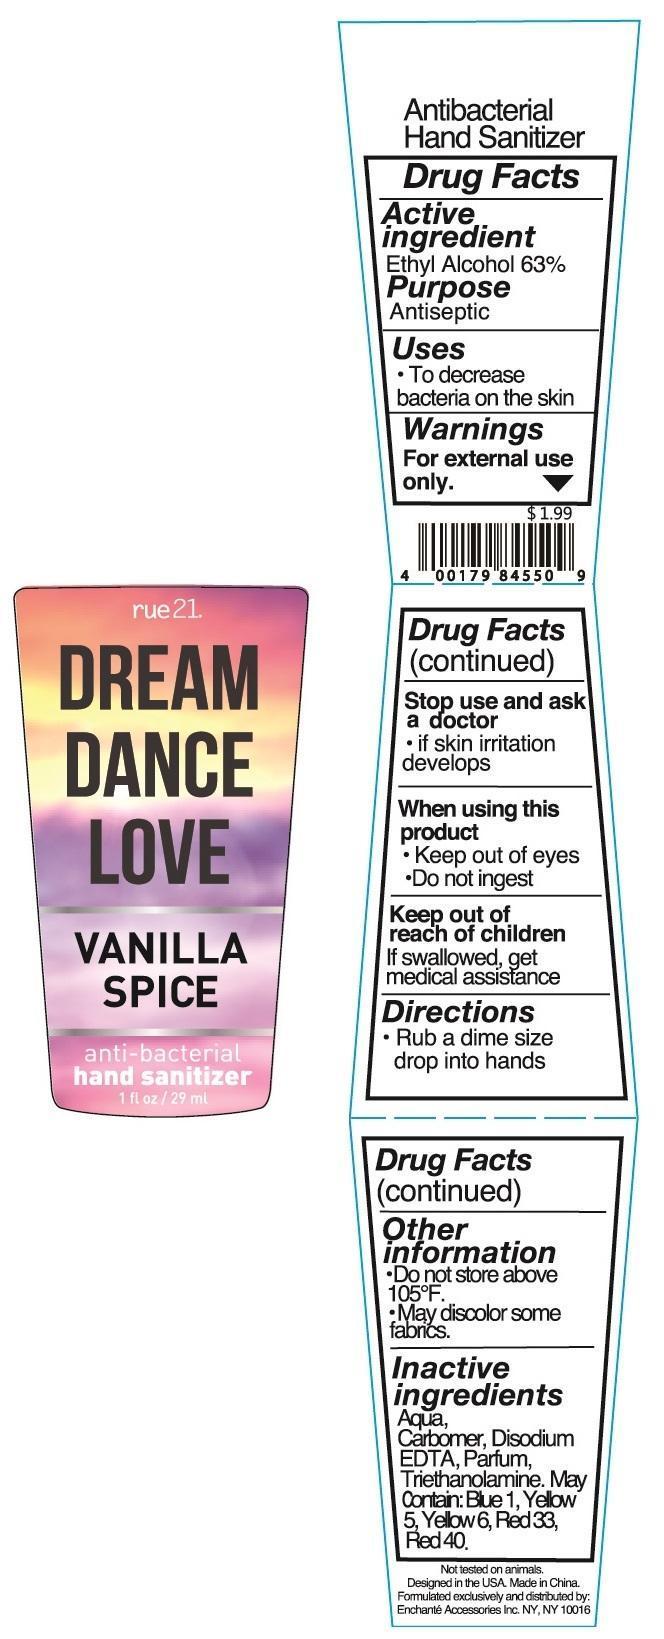 Rue 21 Dream Dance Love Vanilla Spice Anti Bacterial Hand Sanitizer (Alcohol) Liquid [Enchante Accessories Inc. ]